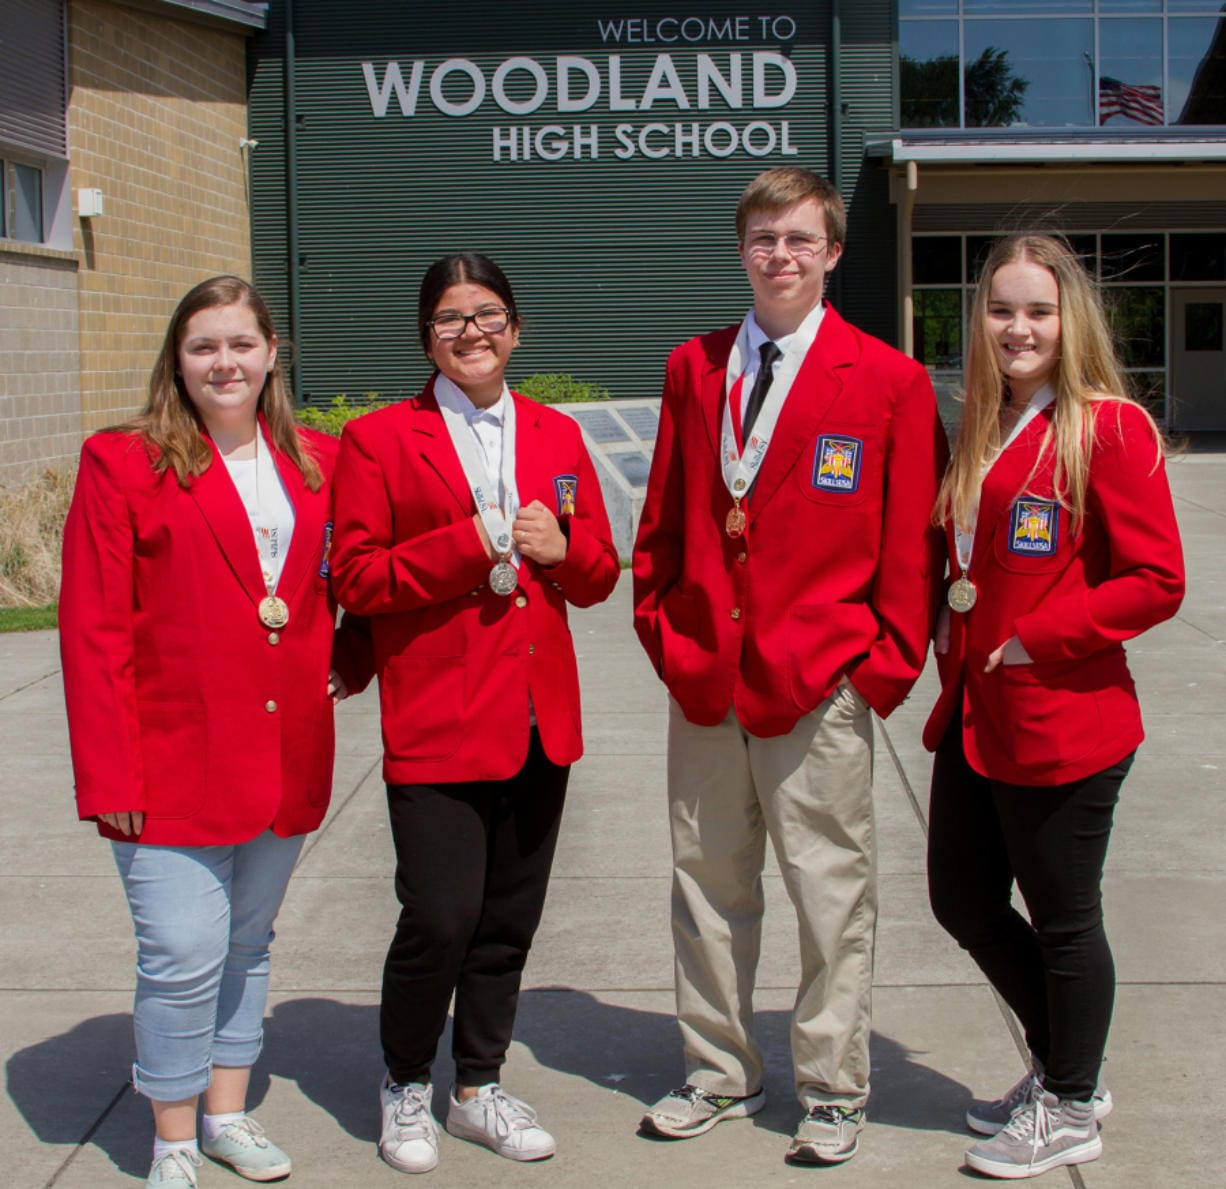 Woodland: Woodland High School SkillsUSA medal winners, from left, Katelyn Paulson, Camila Avelar, Caleb Mouat and Brooke Schimmel.